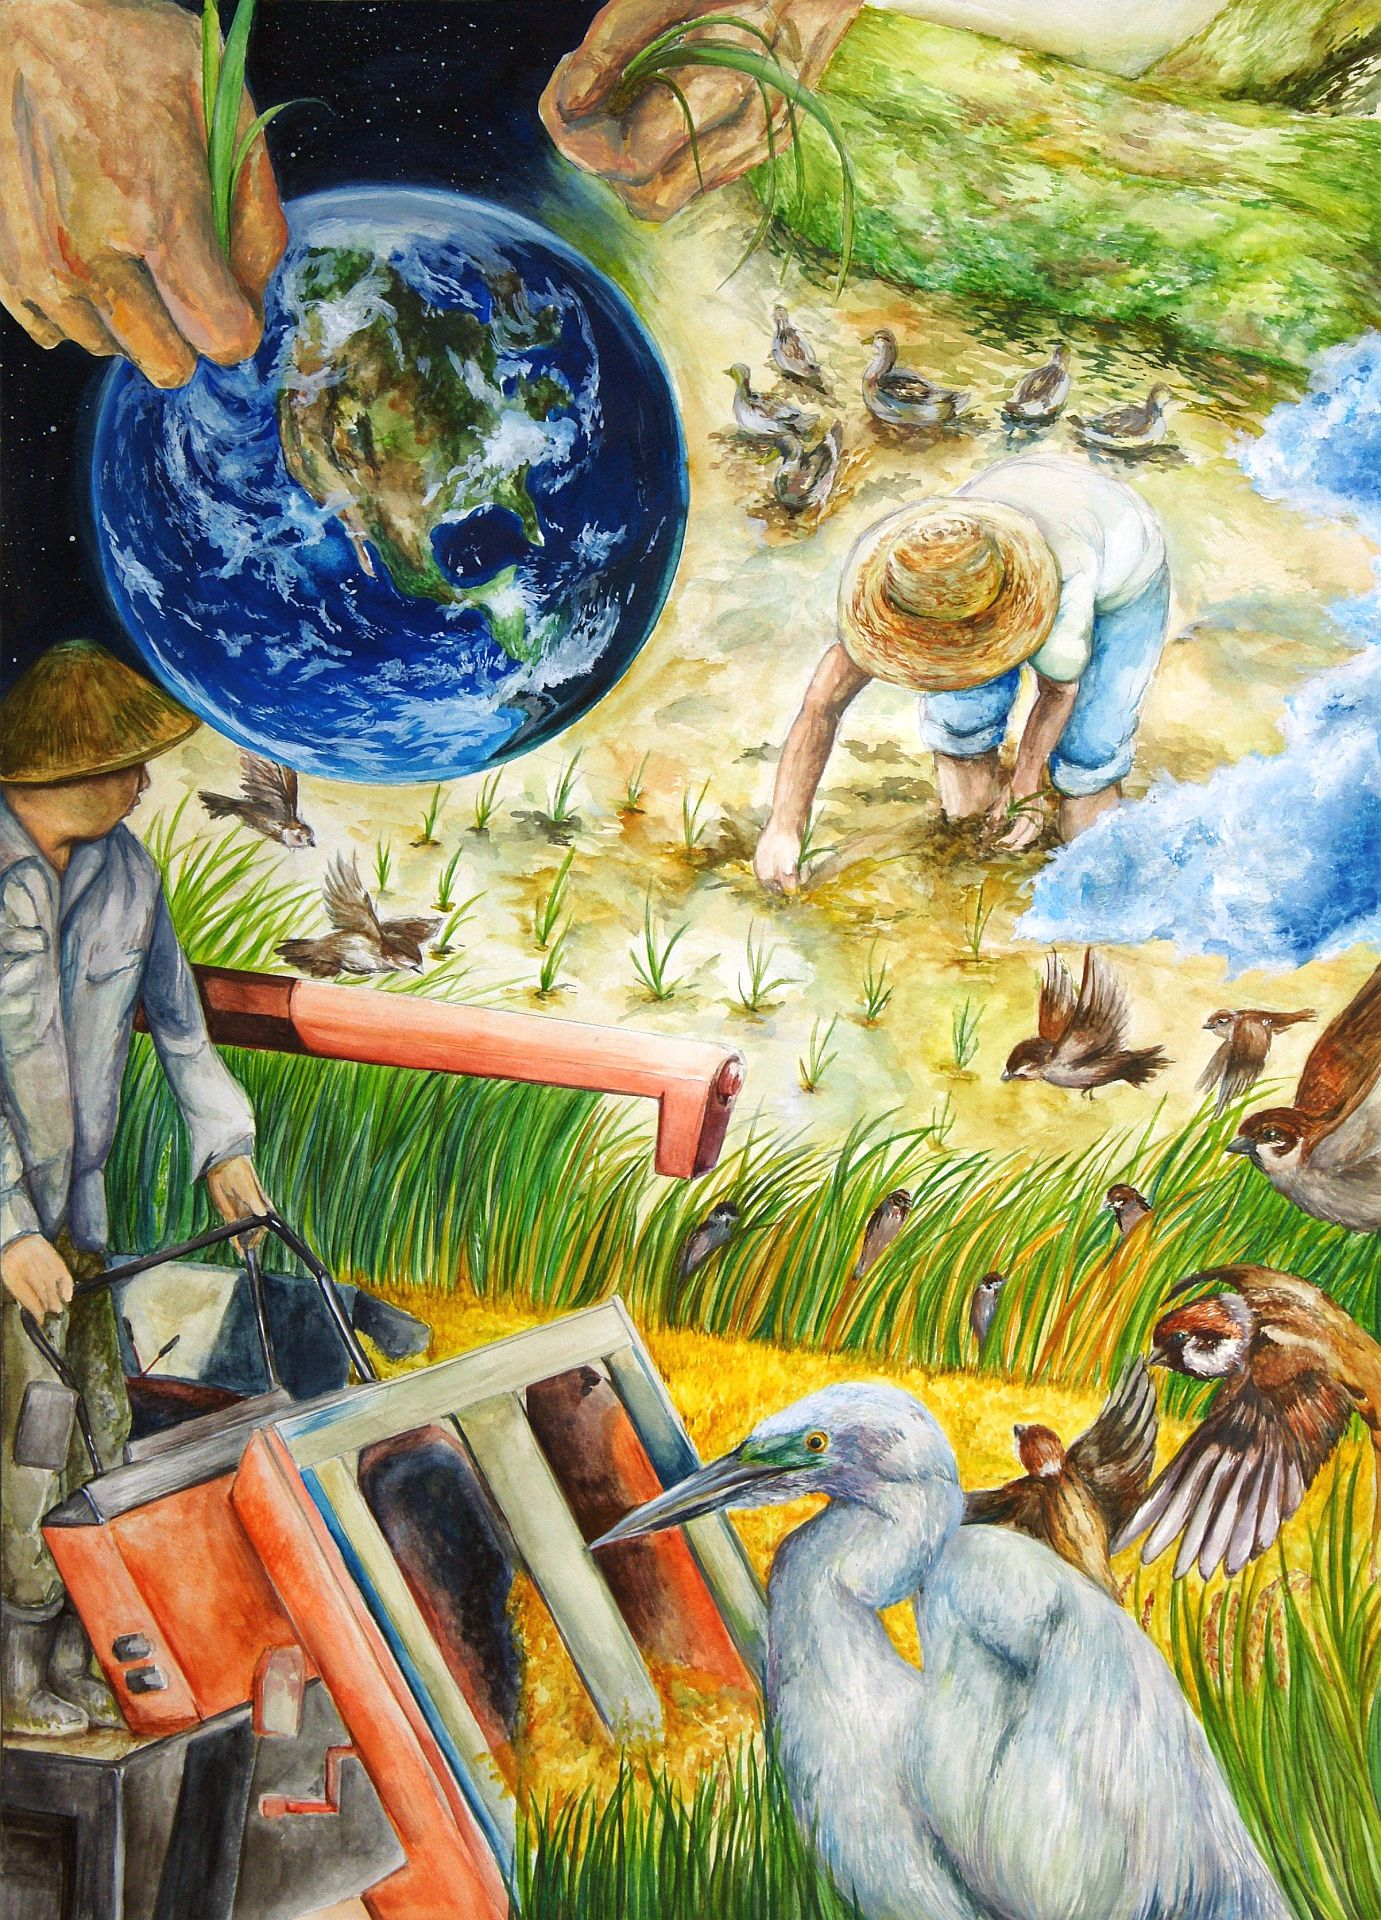 第18回全国小中学校児童・生徒環境絵画コンクール 入賞作品